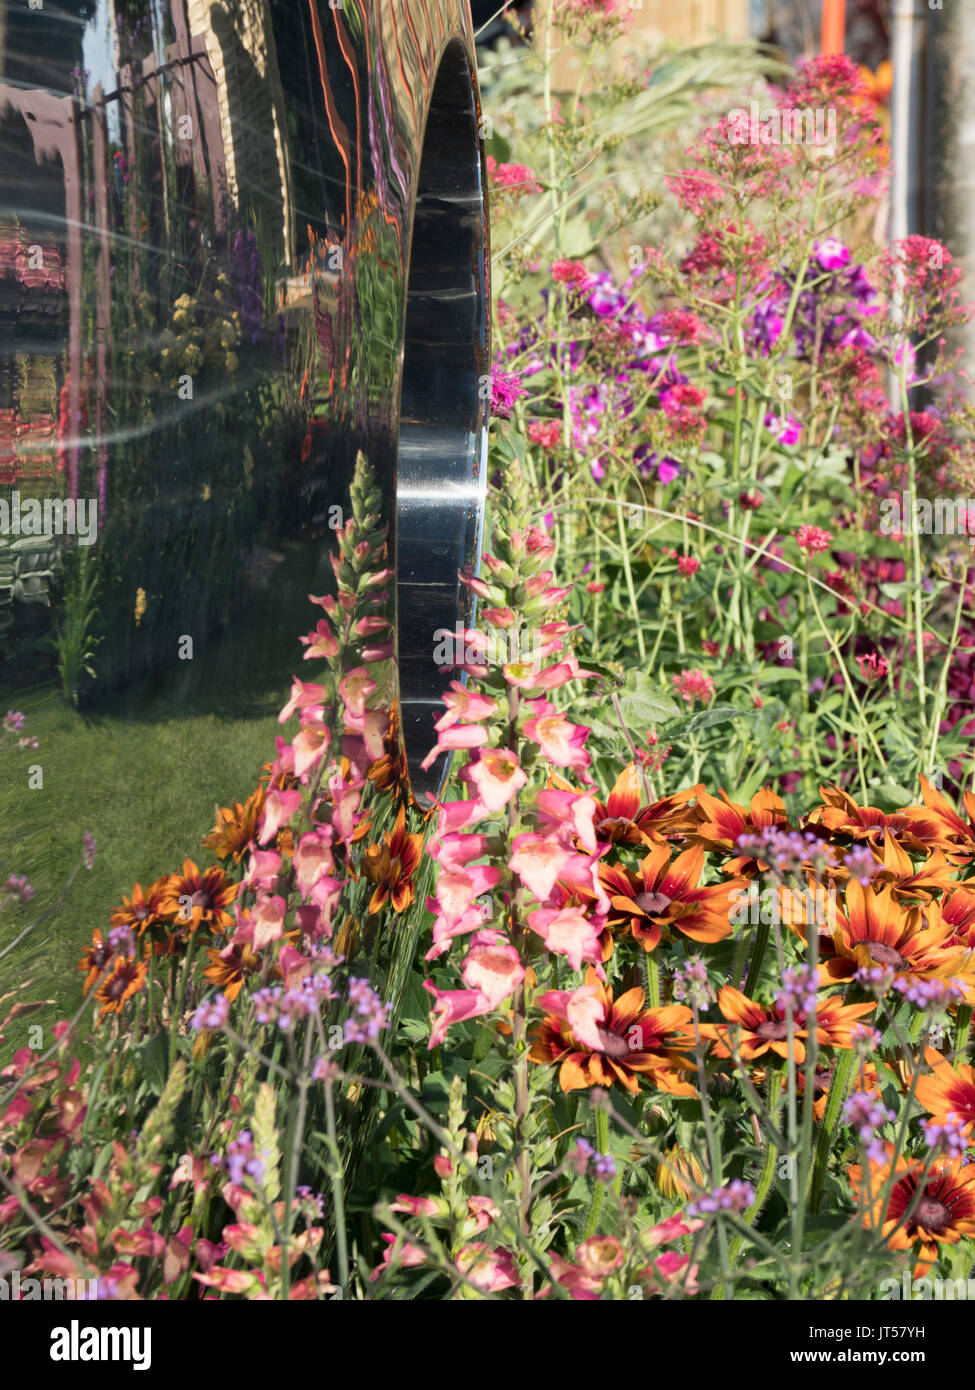 David harper stock photos david harper stock images alamy for Pip probert garden designer